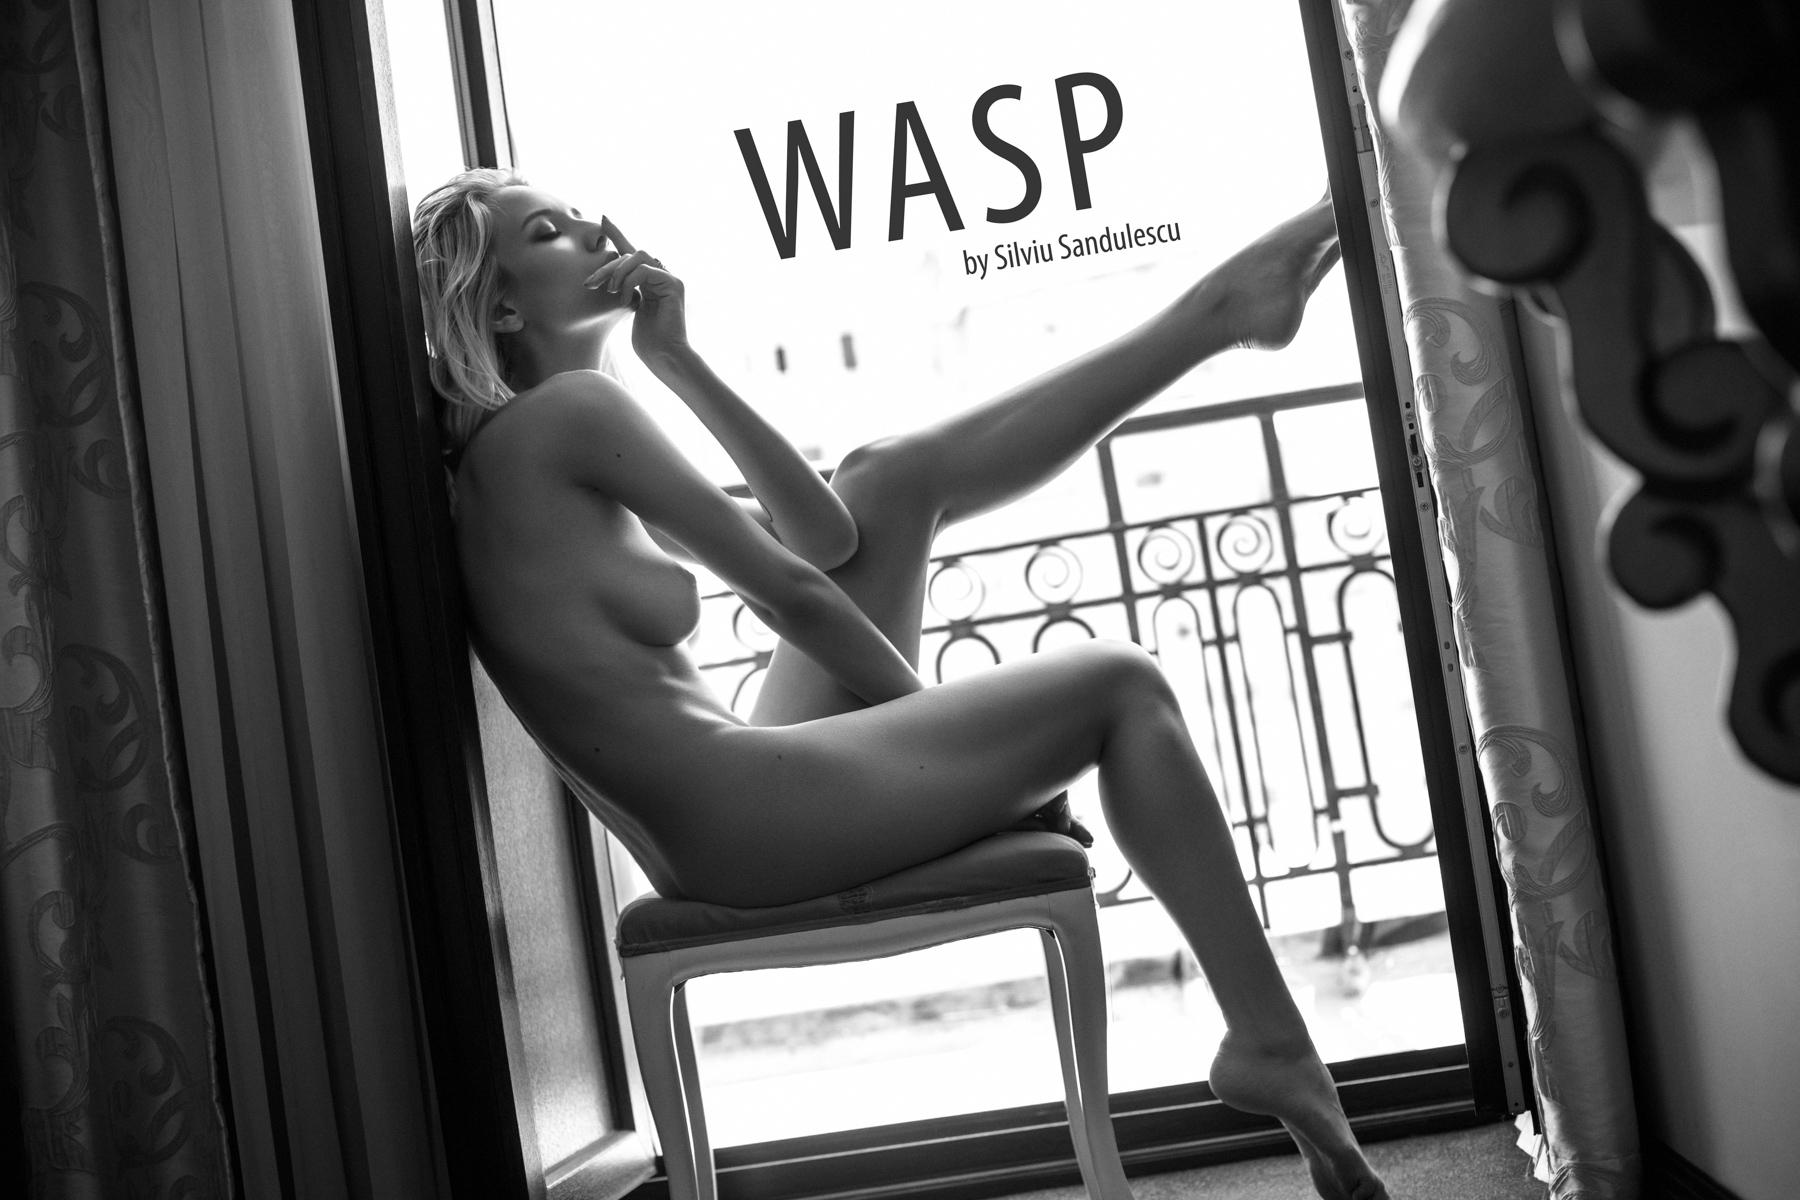 Monica Wasp